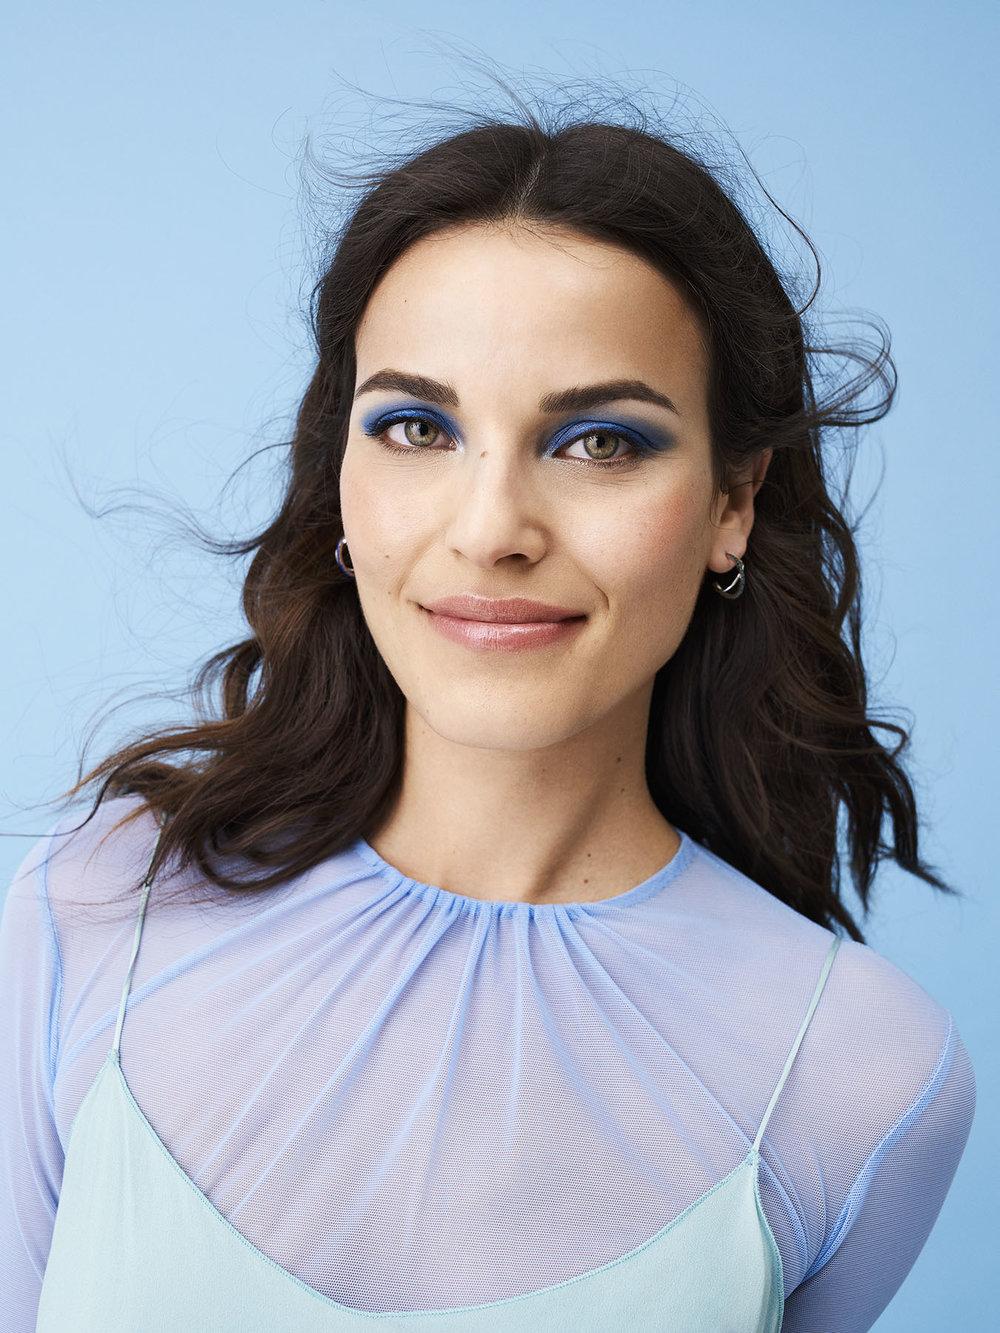 Photo: Nadya Wasylko  Hair: Jeanie Syfu  Makeup: Suzy Gernstein  Wardrobe: Morgan Gibbons  Manicure: Yukie Miyakawa  Model: Danielle Breier